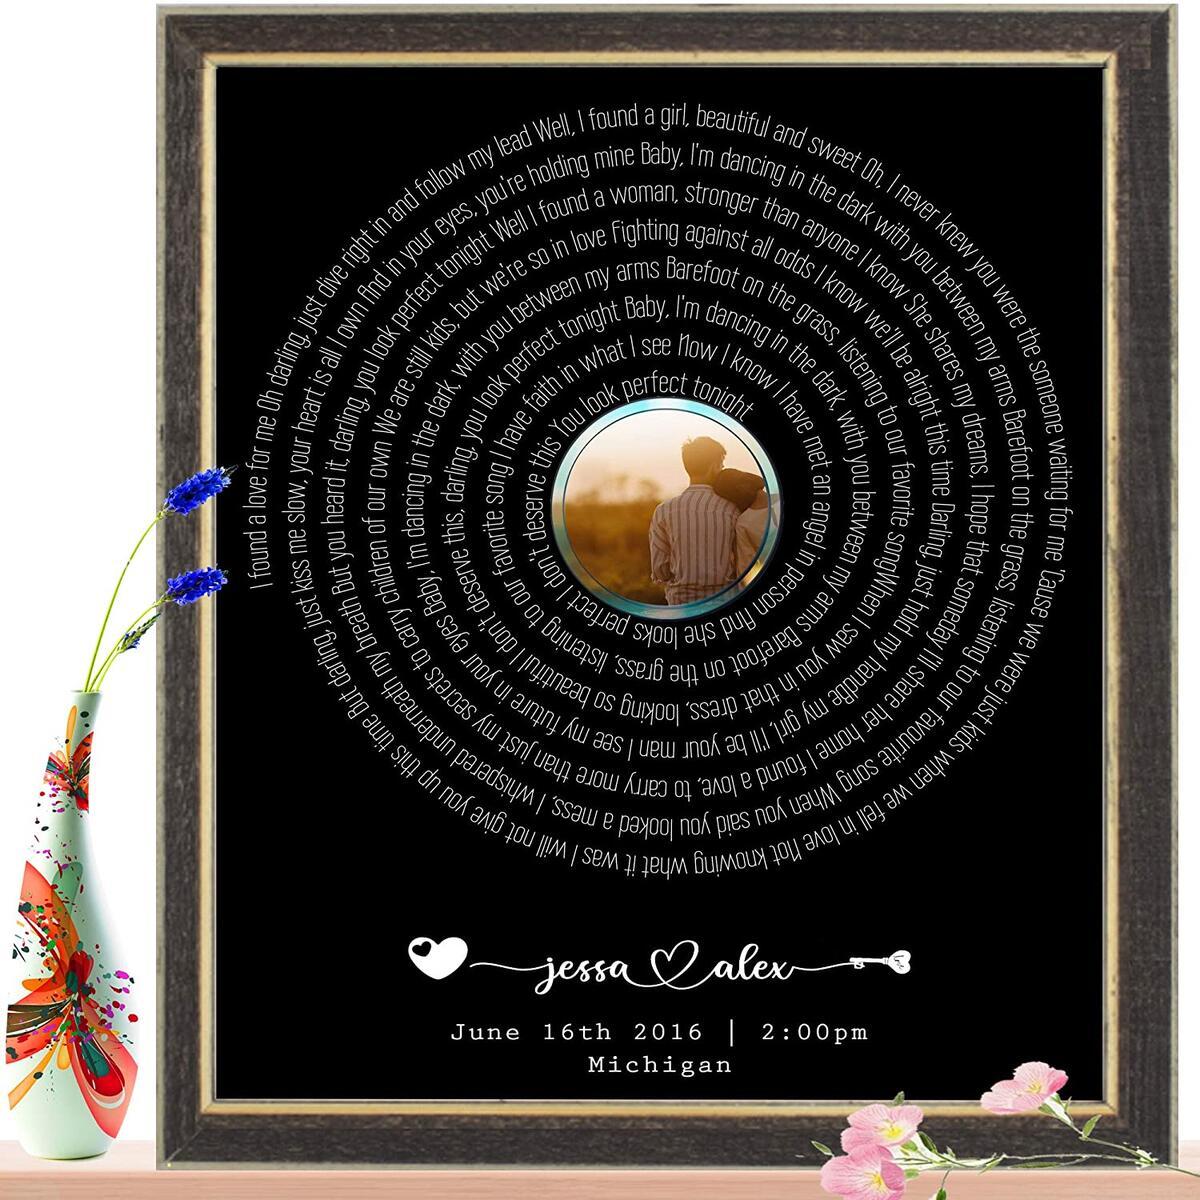 Custom Song Lyrics Wall Art Decor Print - Wedding Song Lyrics, First Dance Song Poster, Personalized Anniversary Gift (Multiple Sizes , Unframed / Framed)